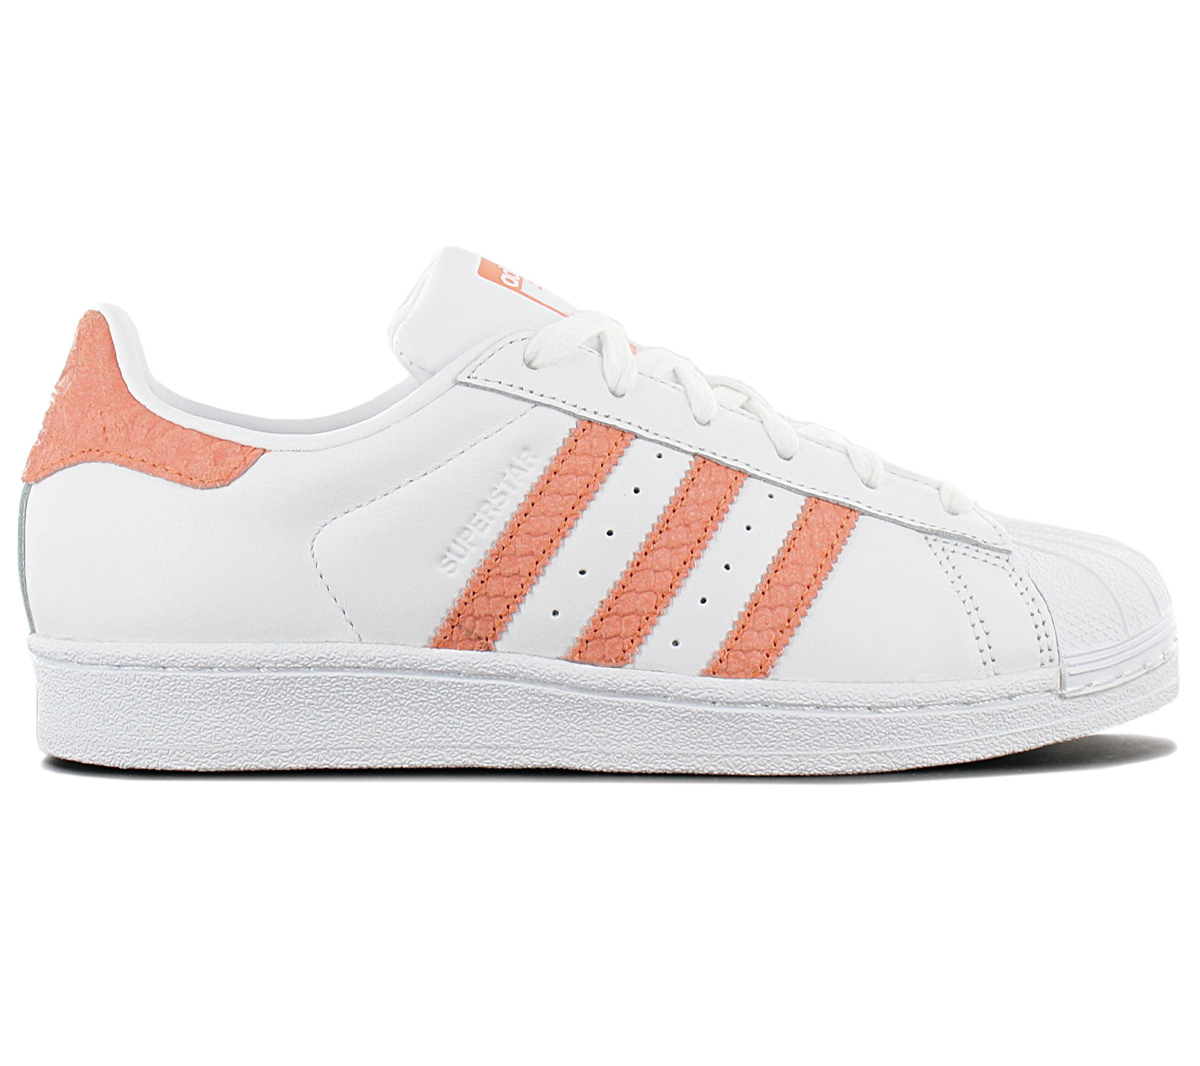 adidas Superstar W shoes white orange